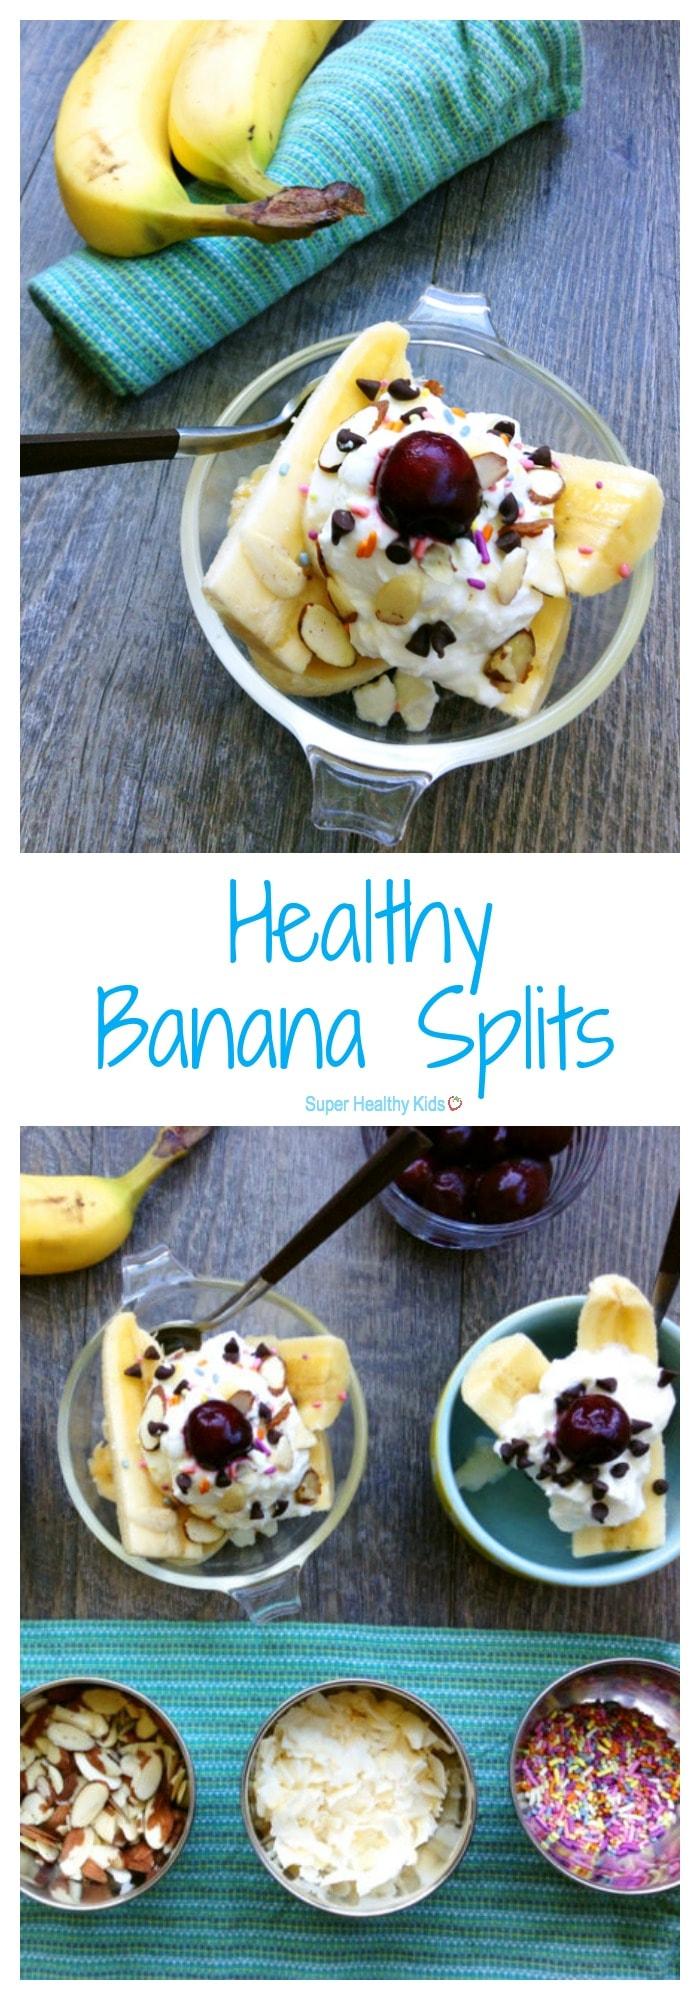 FOOD - Healthy Banana Splits. Turn a traditionally-decadent dessert into a healthful snack with whole milk yogurt, fruit, seeds and dark chocolate chips! https://www.superhealthykids.com/kids-favorite-healthy-banana-split/